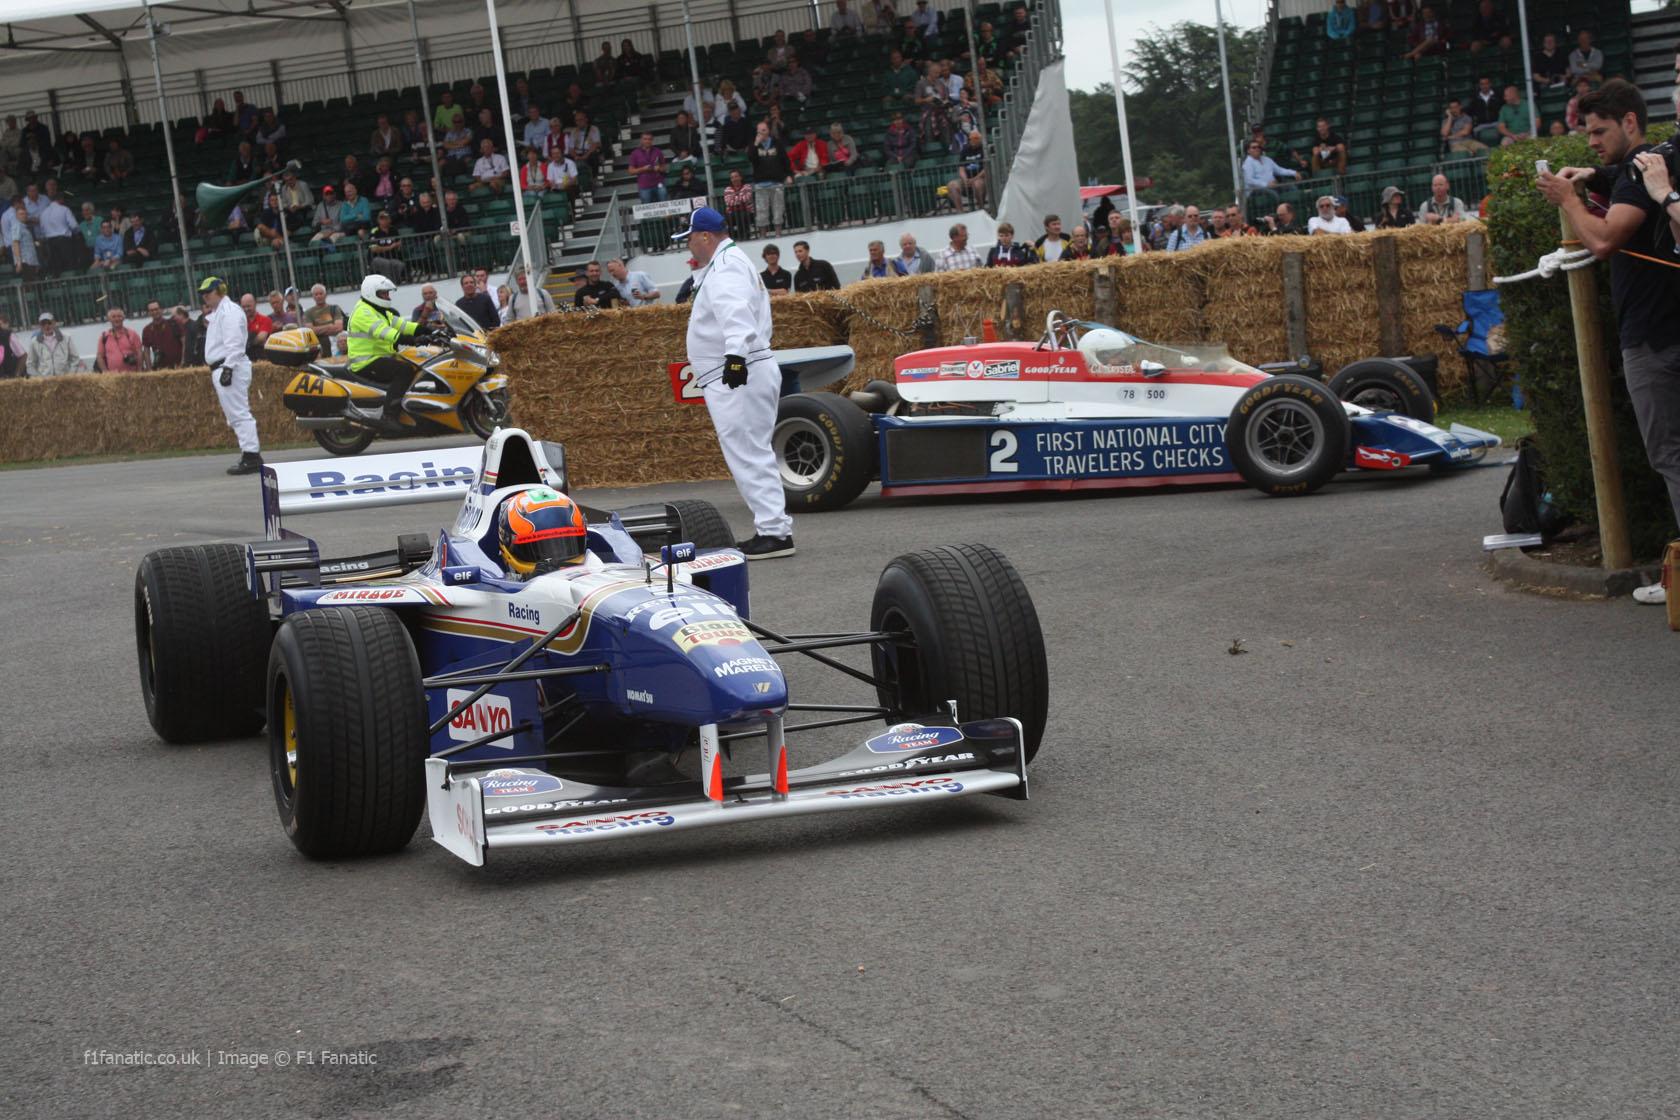 Williams FW18 (4), Goodwood Festival of Speed, 2014